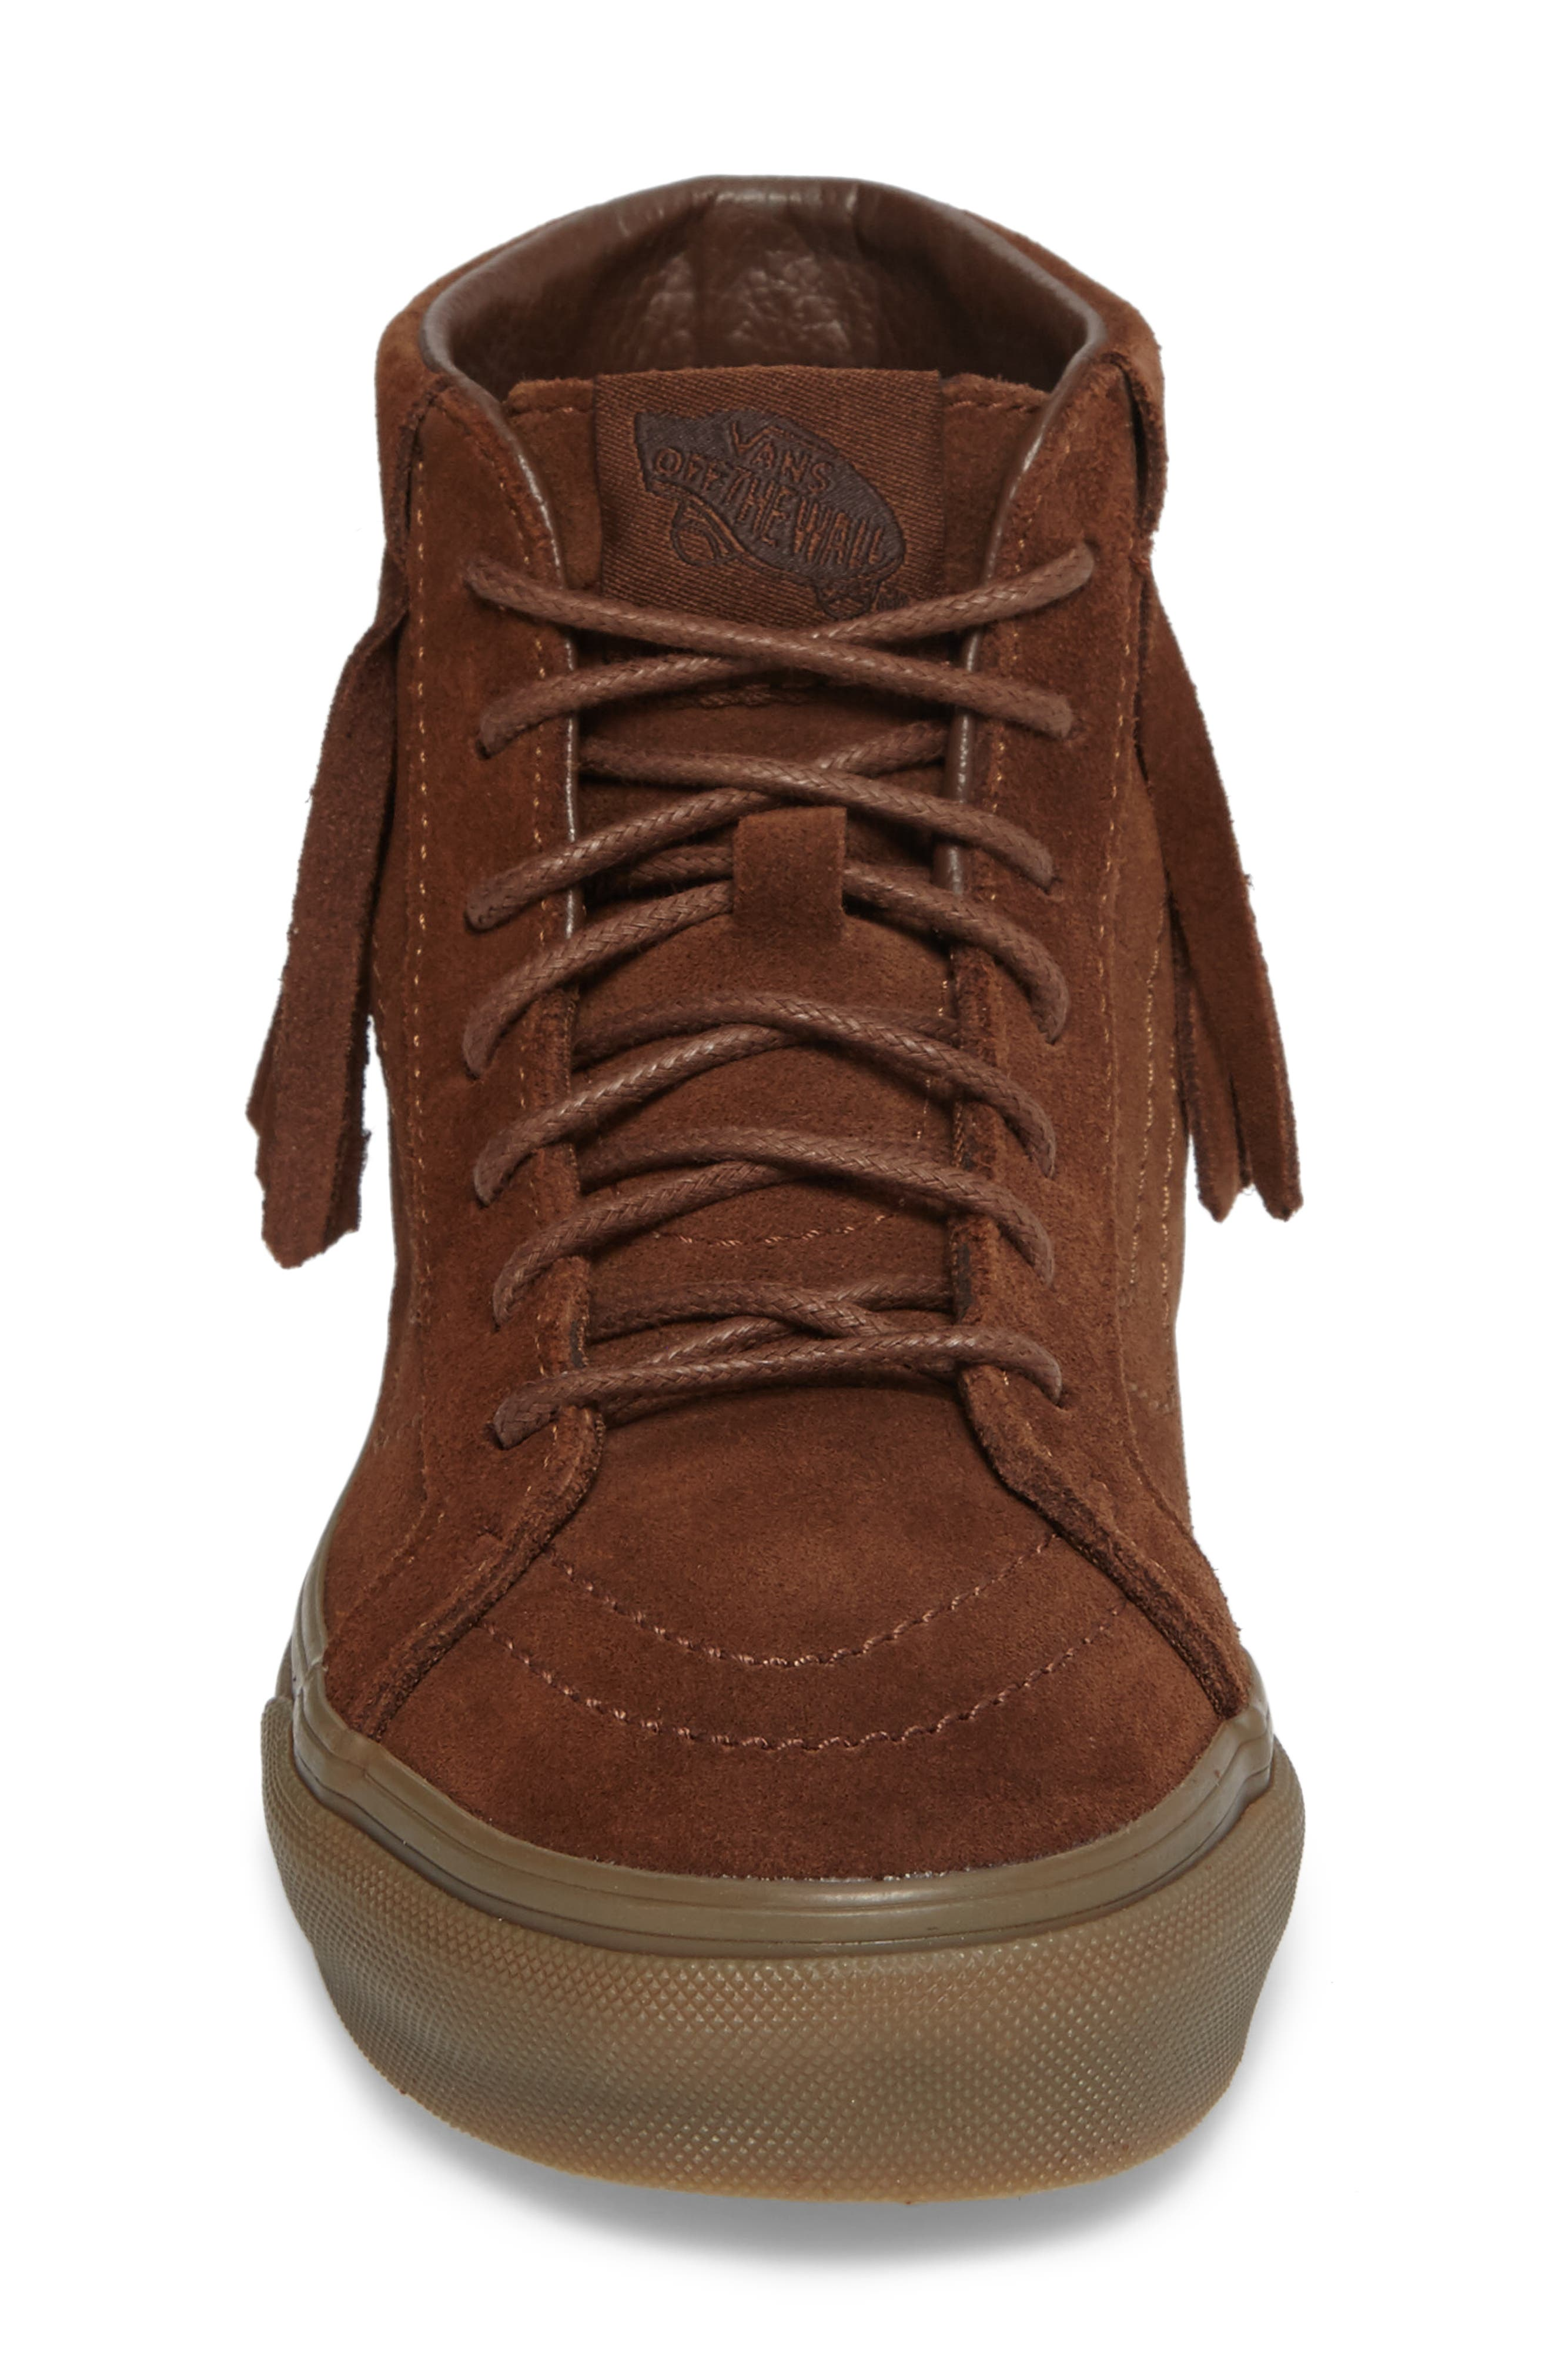 SK8-Hi Moc Sneaker,                             Alternate thumbnail 4, color,                             200